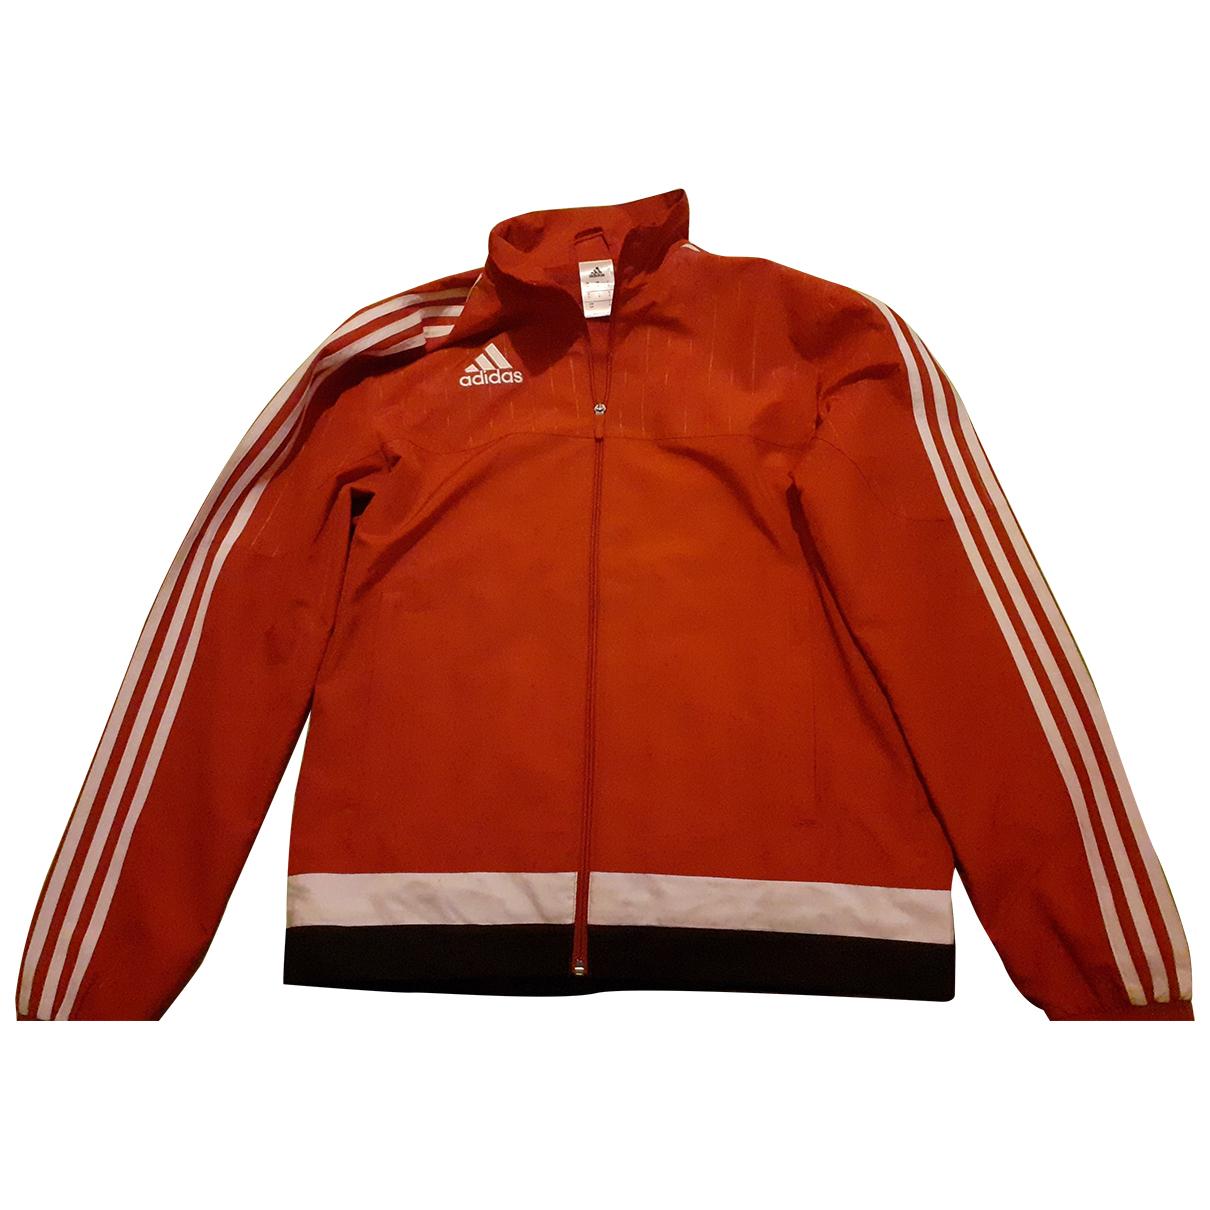 Adidas N Red jacket  for Men M International